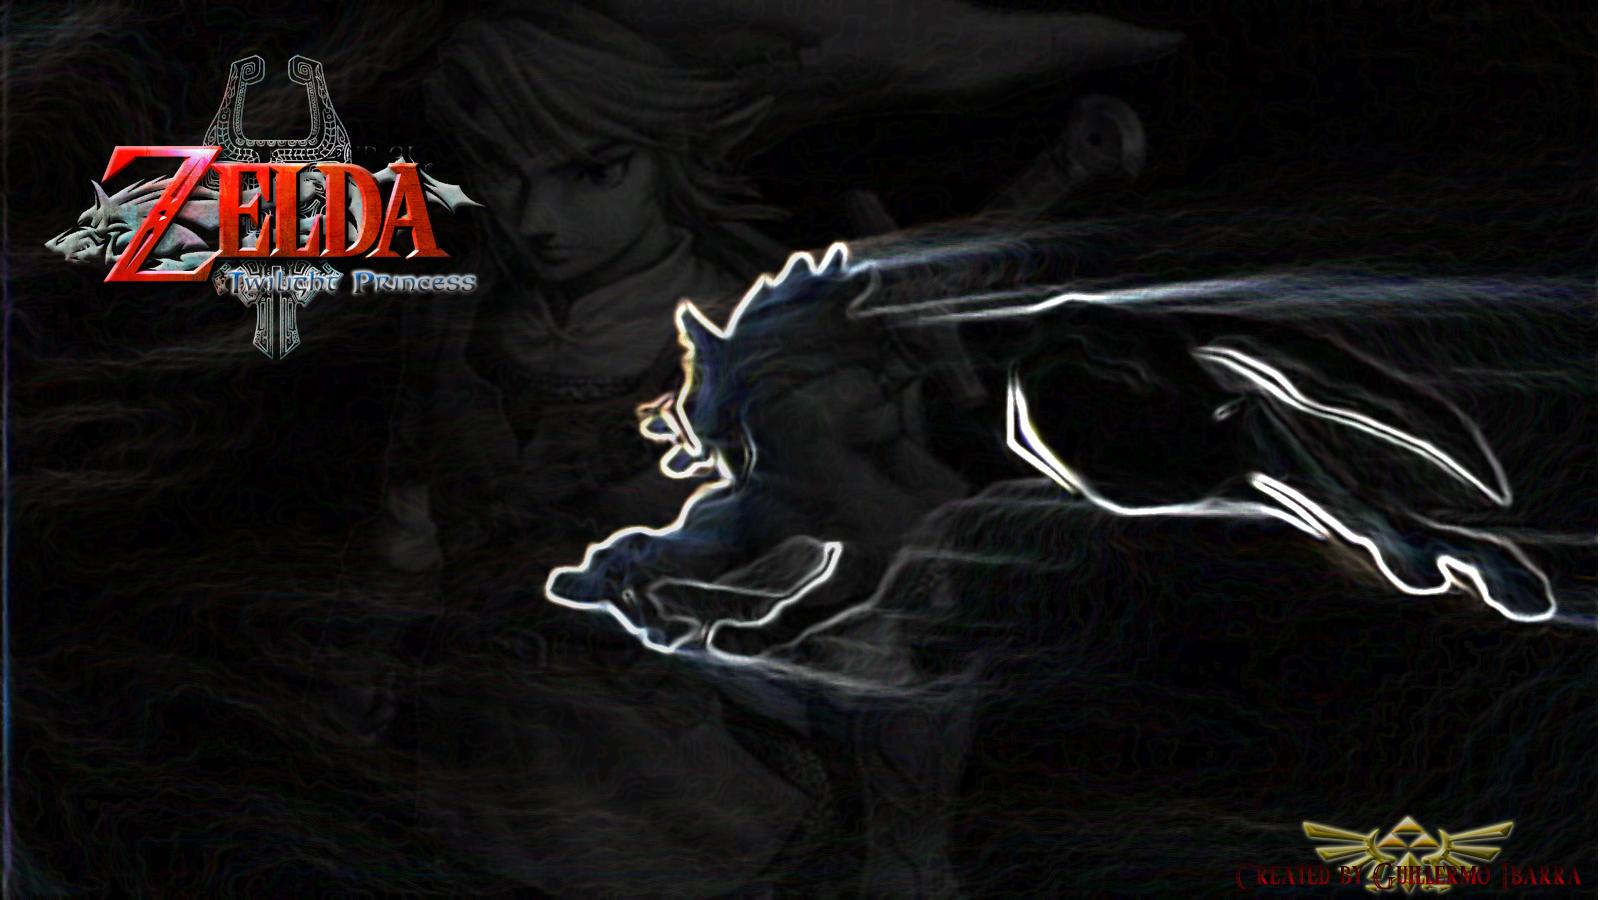 Twilight Princess 'Wolf Link' by Gibarrar on DeviantArt